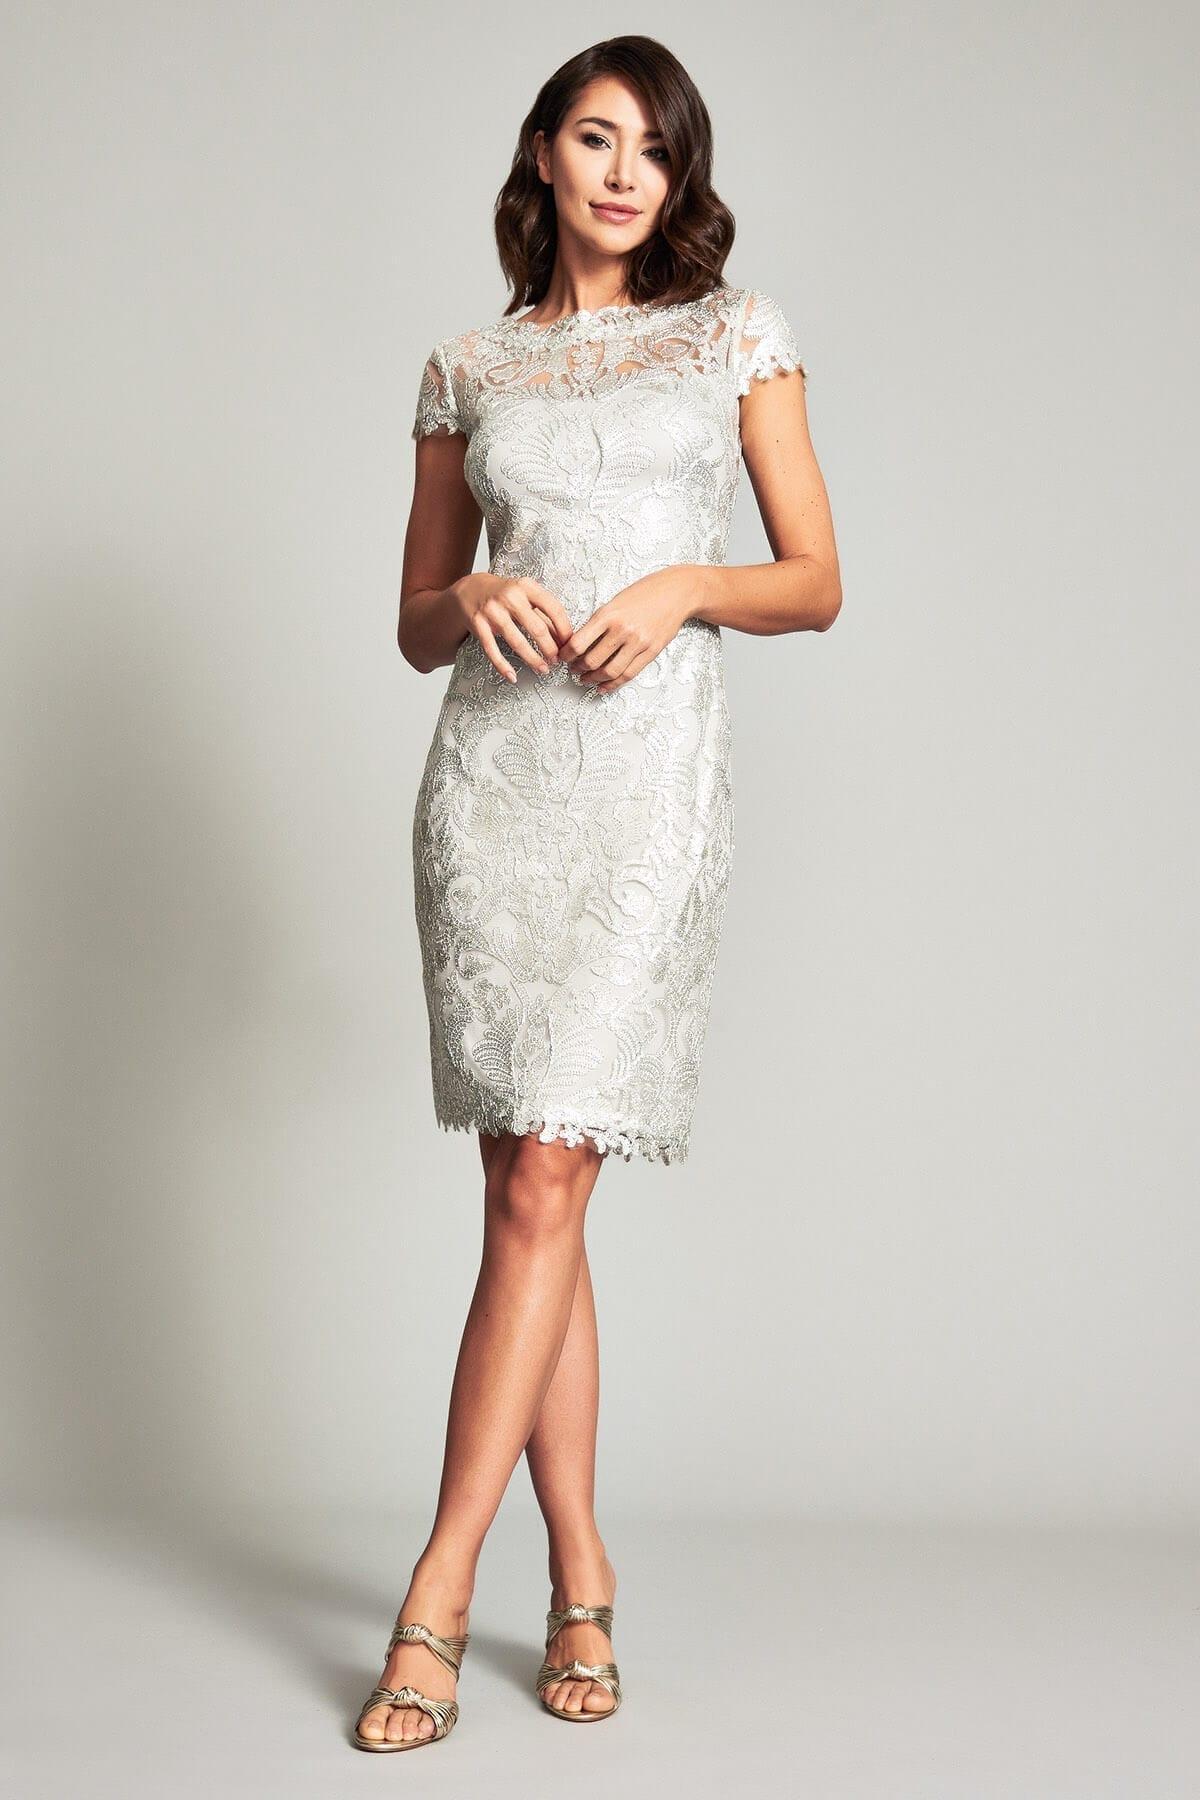 TADASHI SHOJI Clayton Corded Embroidery Dress